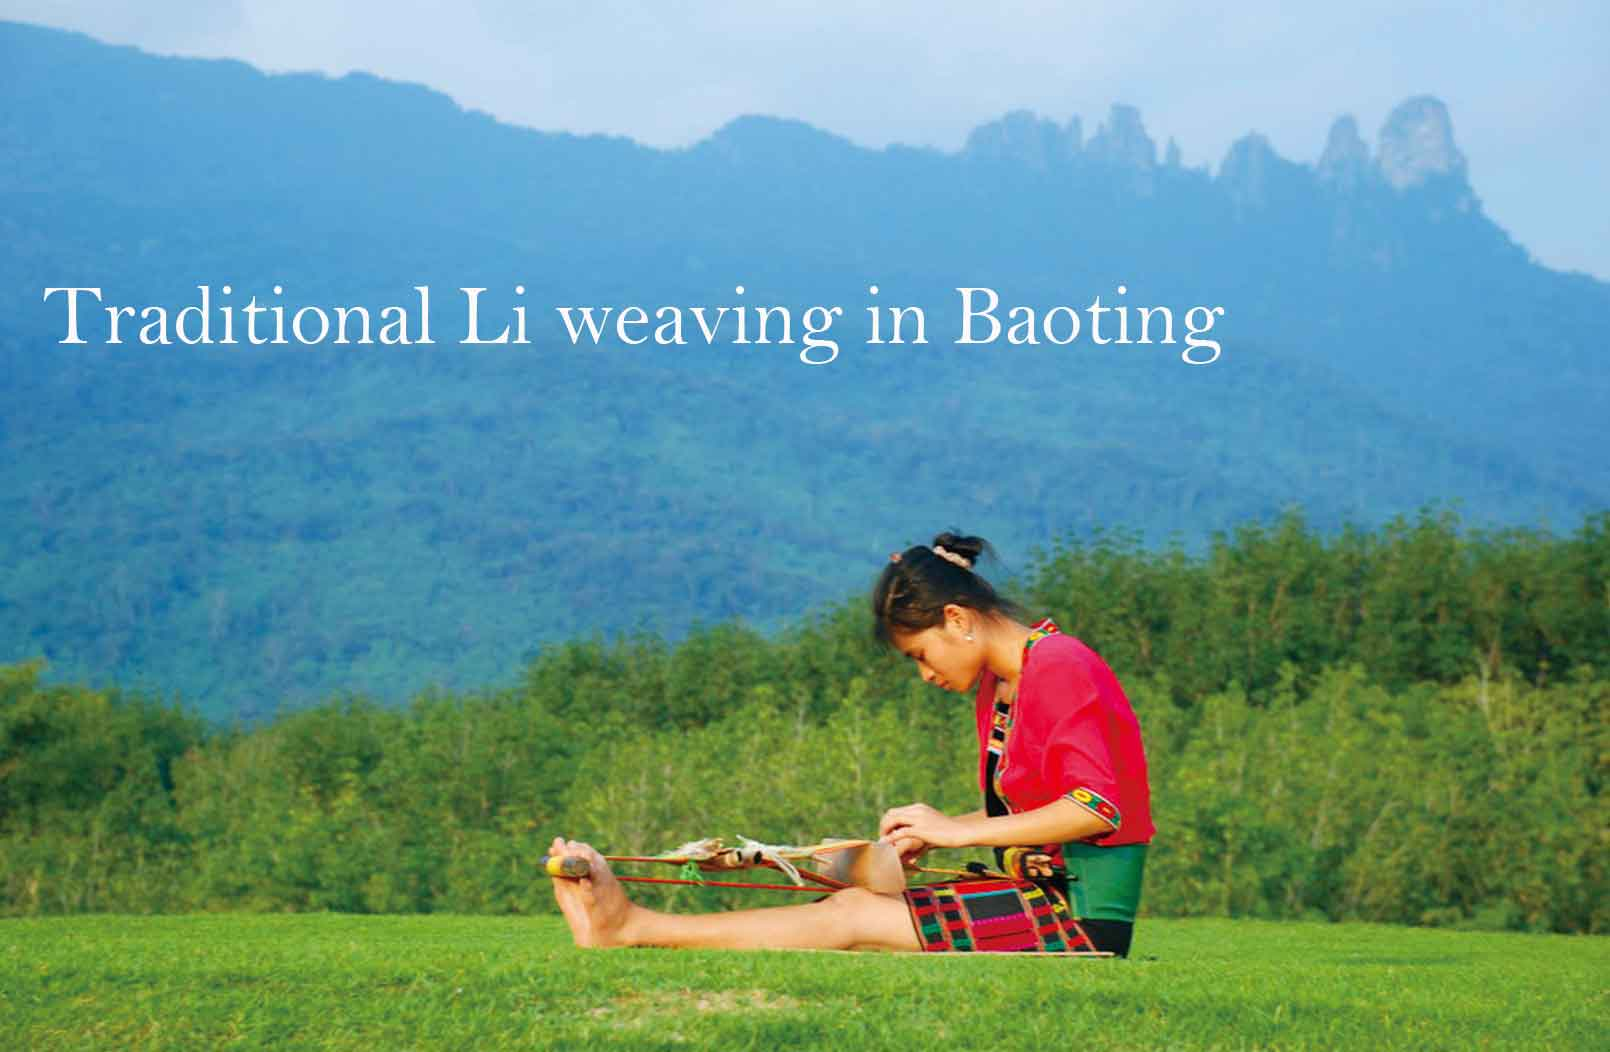 Traditional Li weaving at Baoting